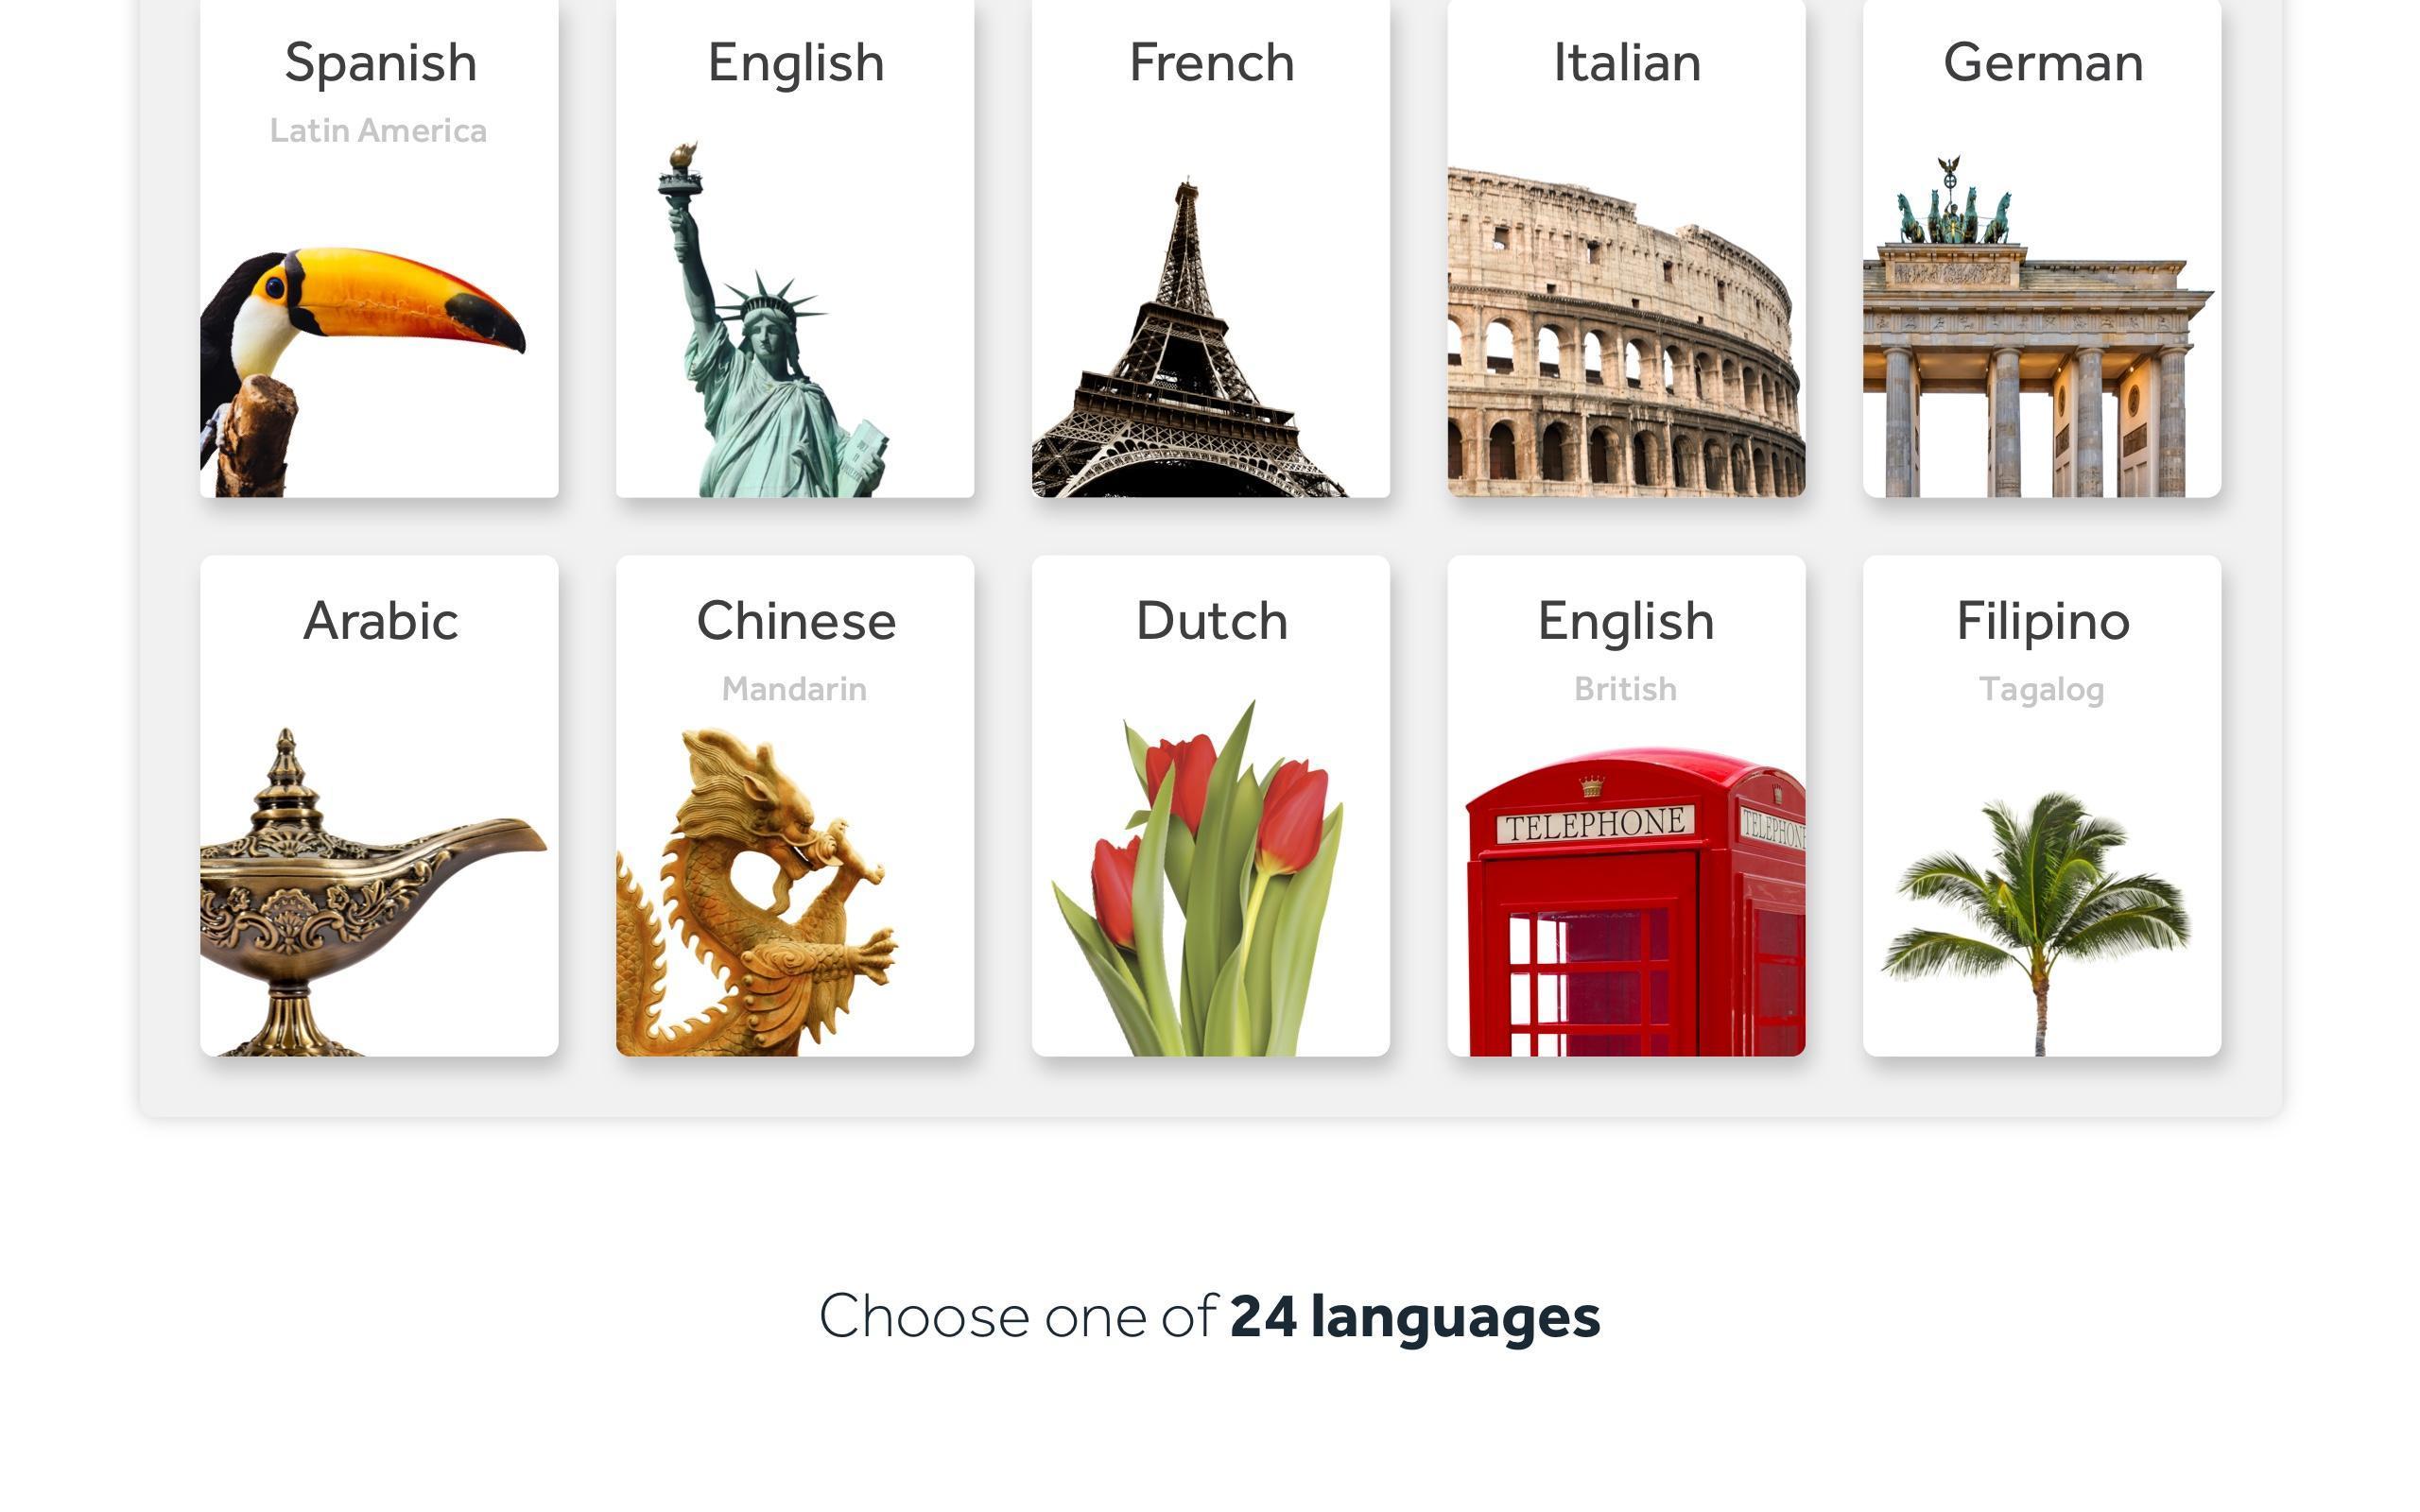 Rosetta Stone Learn Languages 5.7.2 Screenshot 8